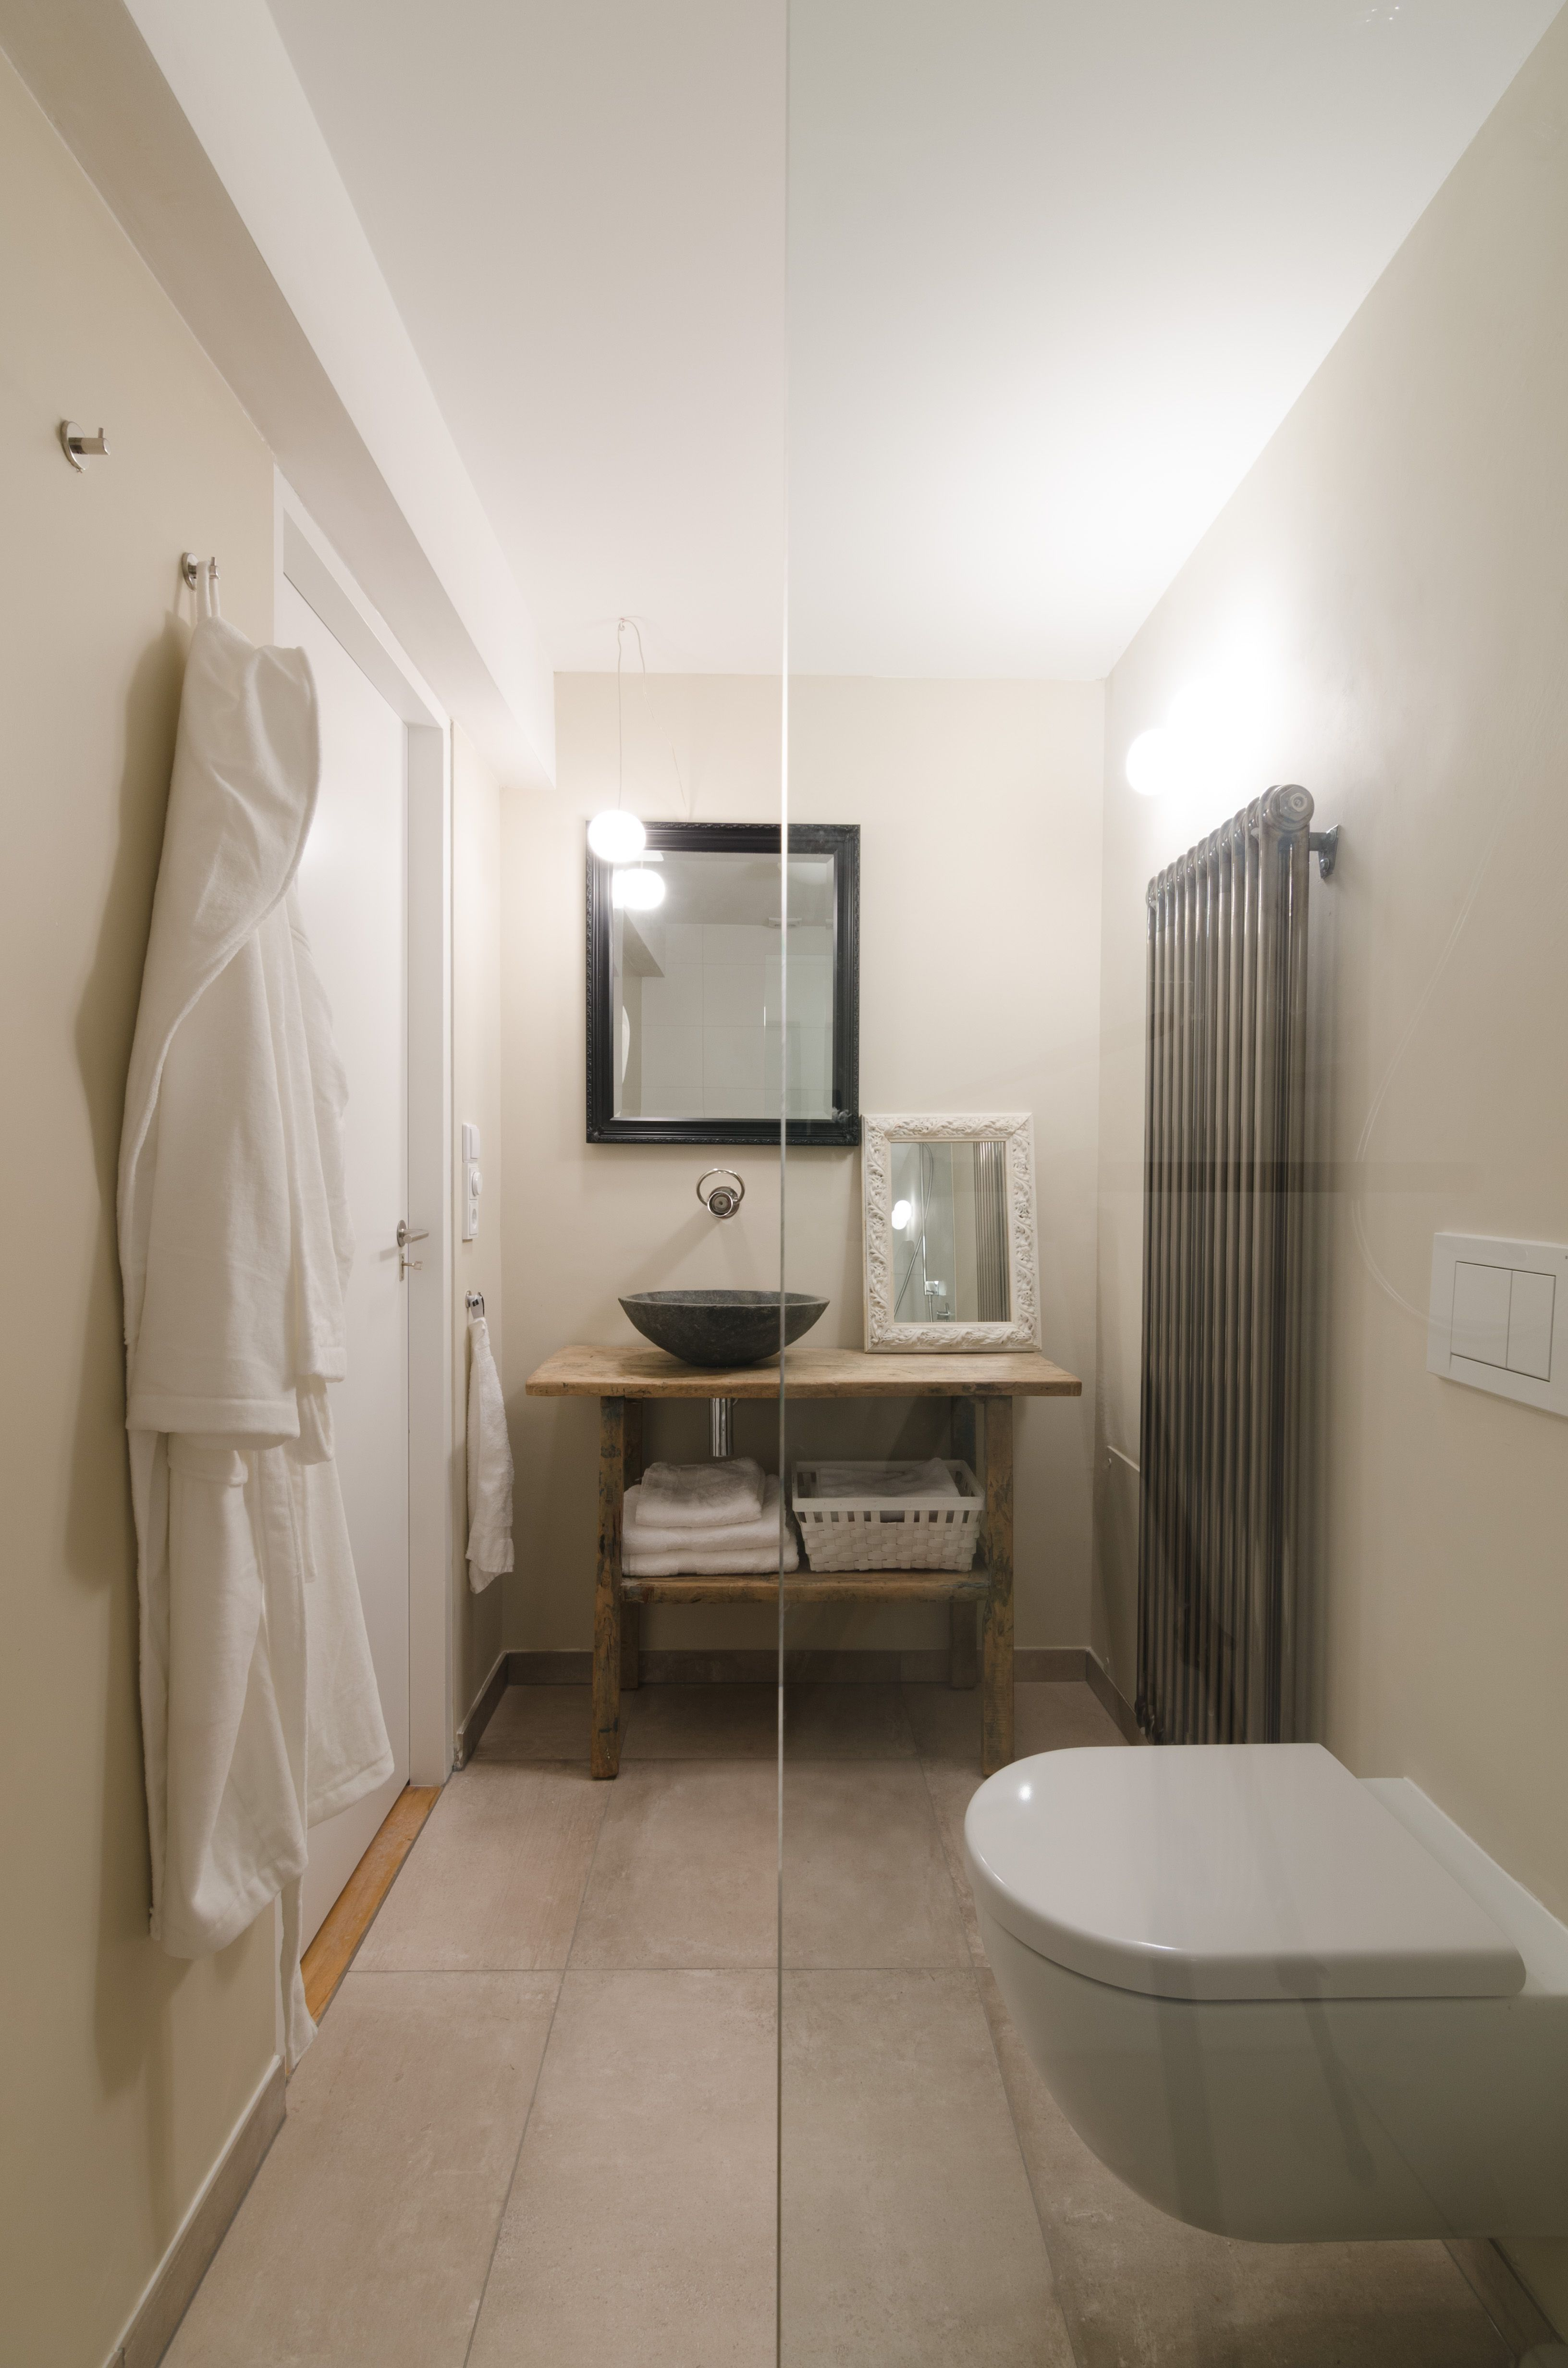 badkamer Amsterdam | keukens en badkamers | Pinterest | Amsterdam